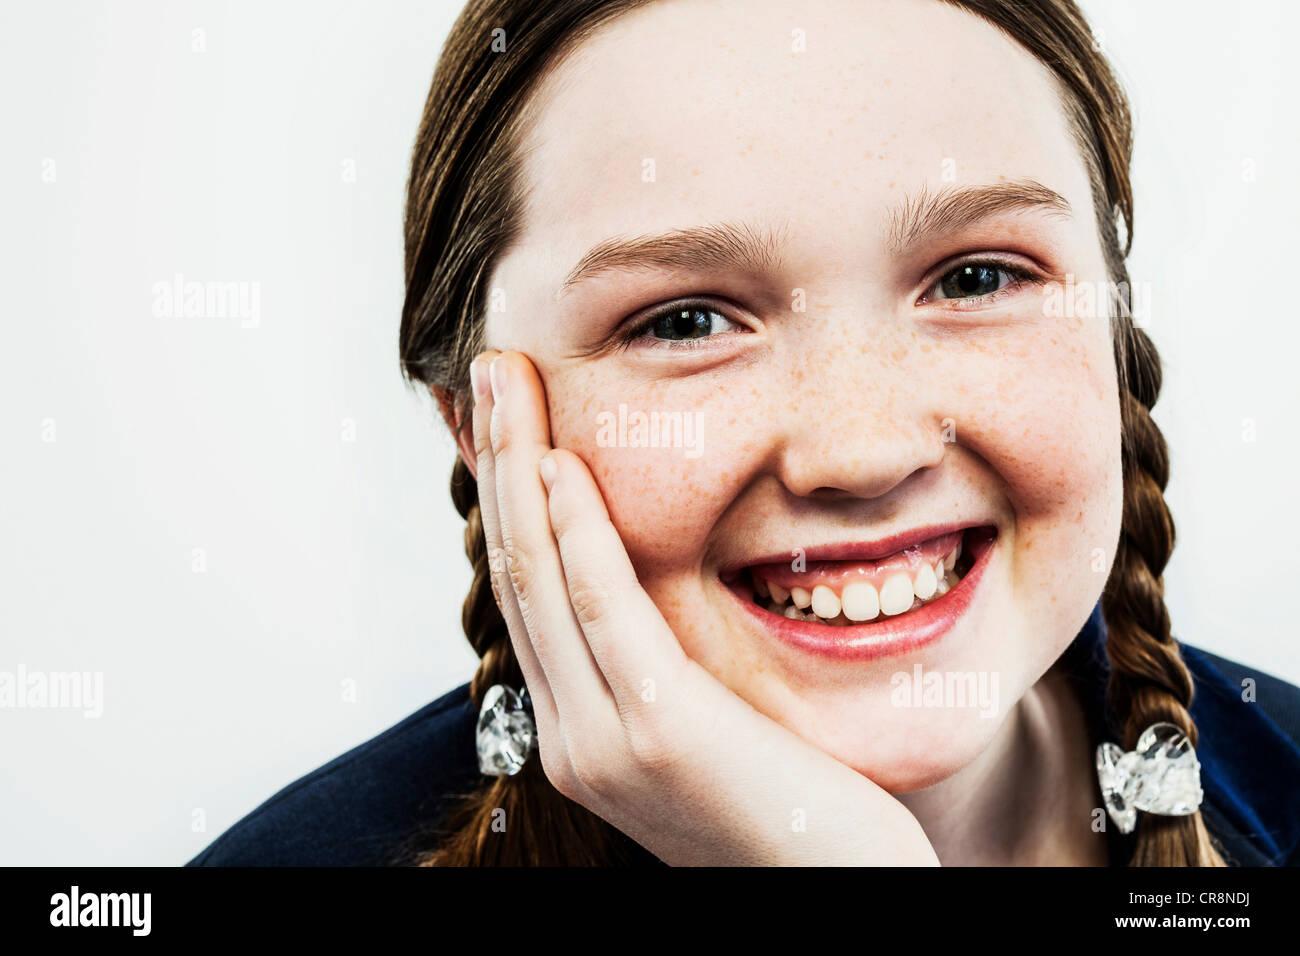 Girl with plaits - Stock Image